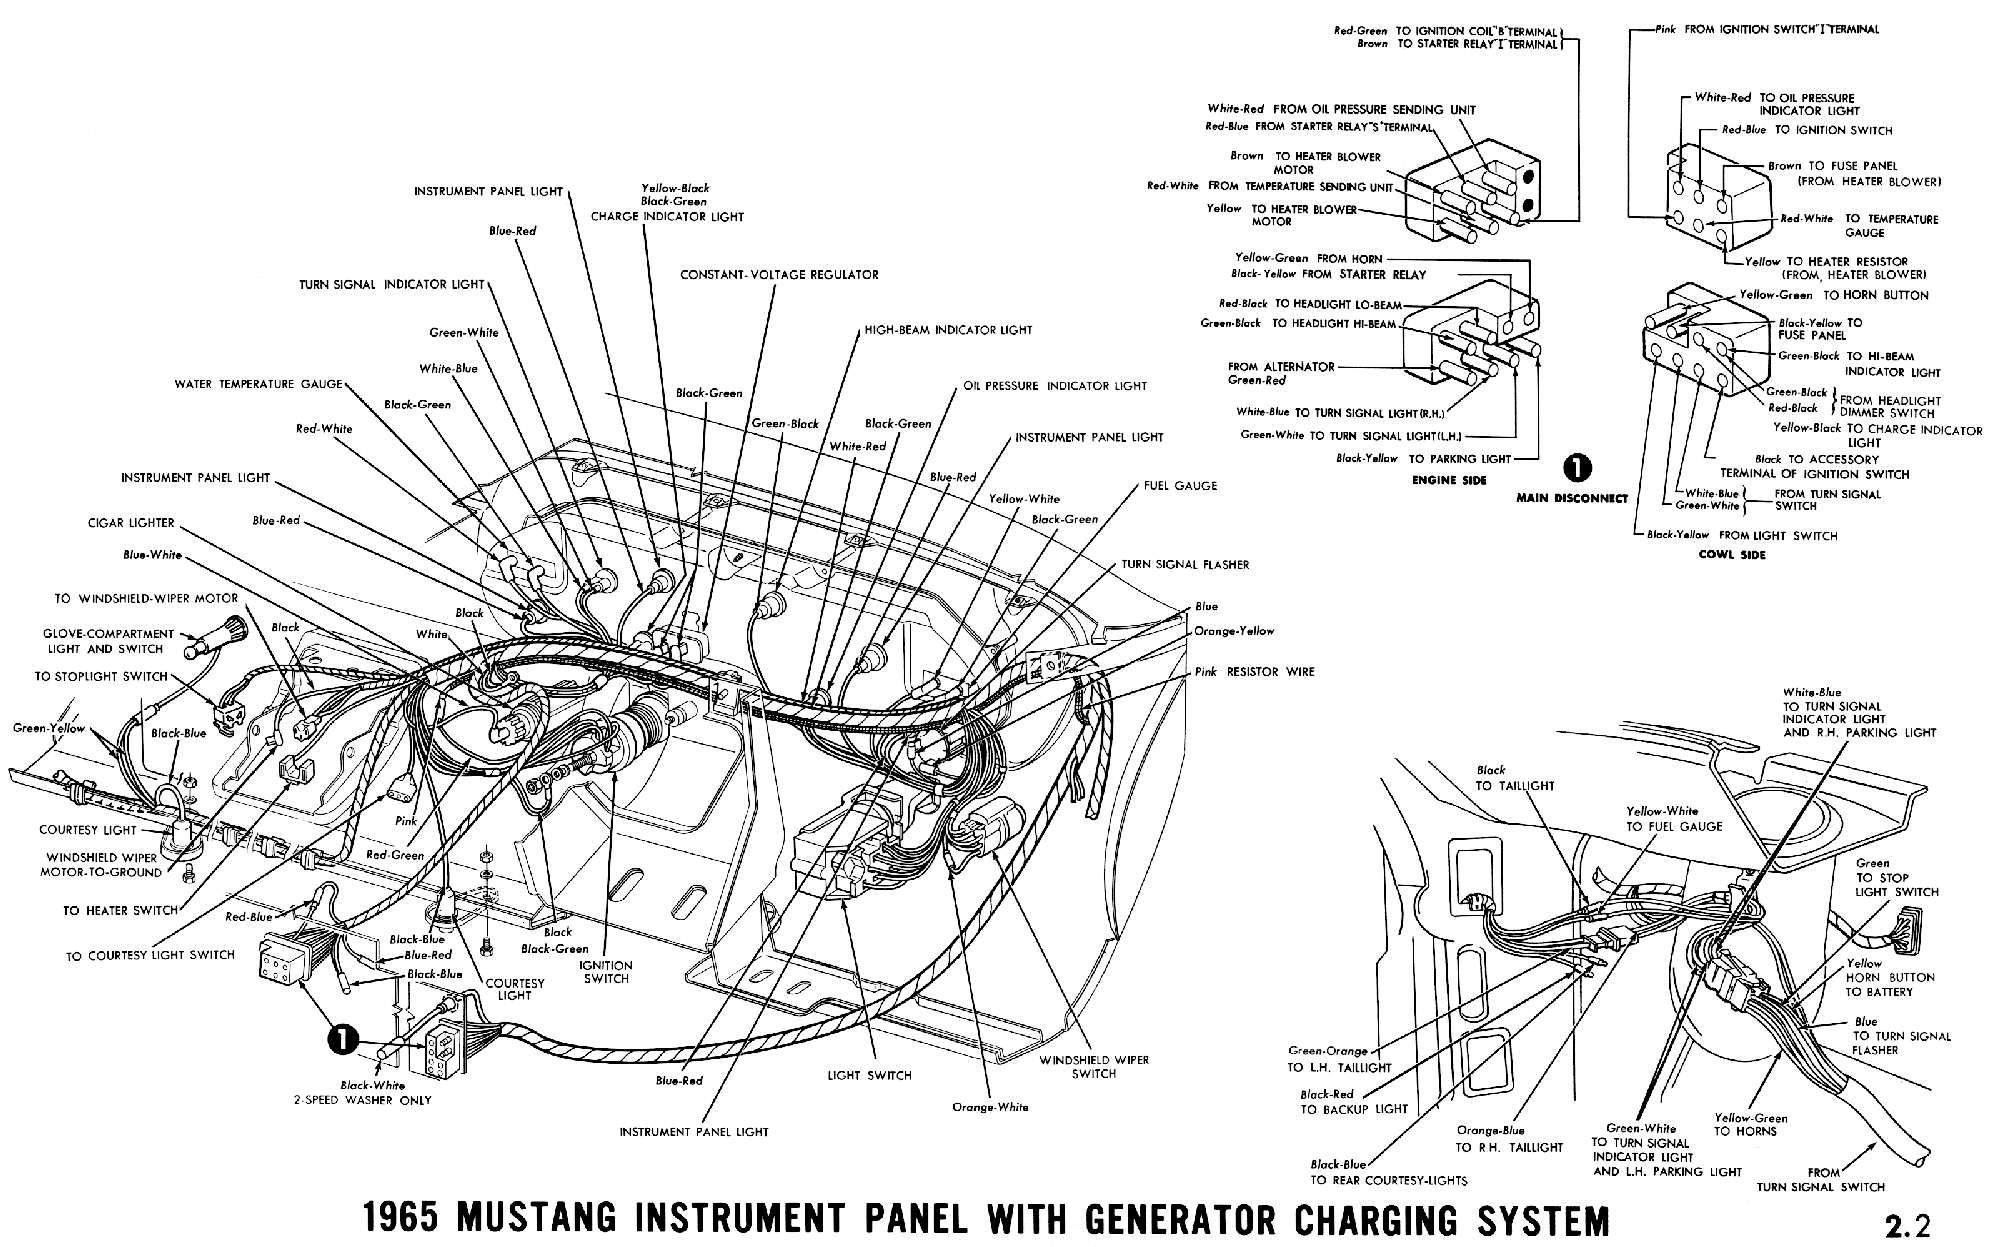 Pleasant 1965 Mustang Wiring Diagrams Automotive Repair 1965 Mustang Wiring Cloud Lukepaidewilluminateatxorg